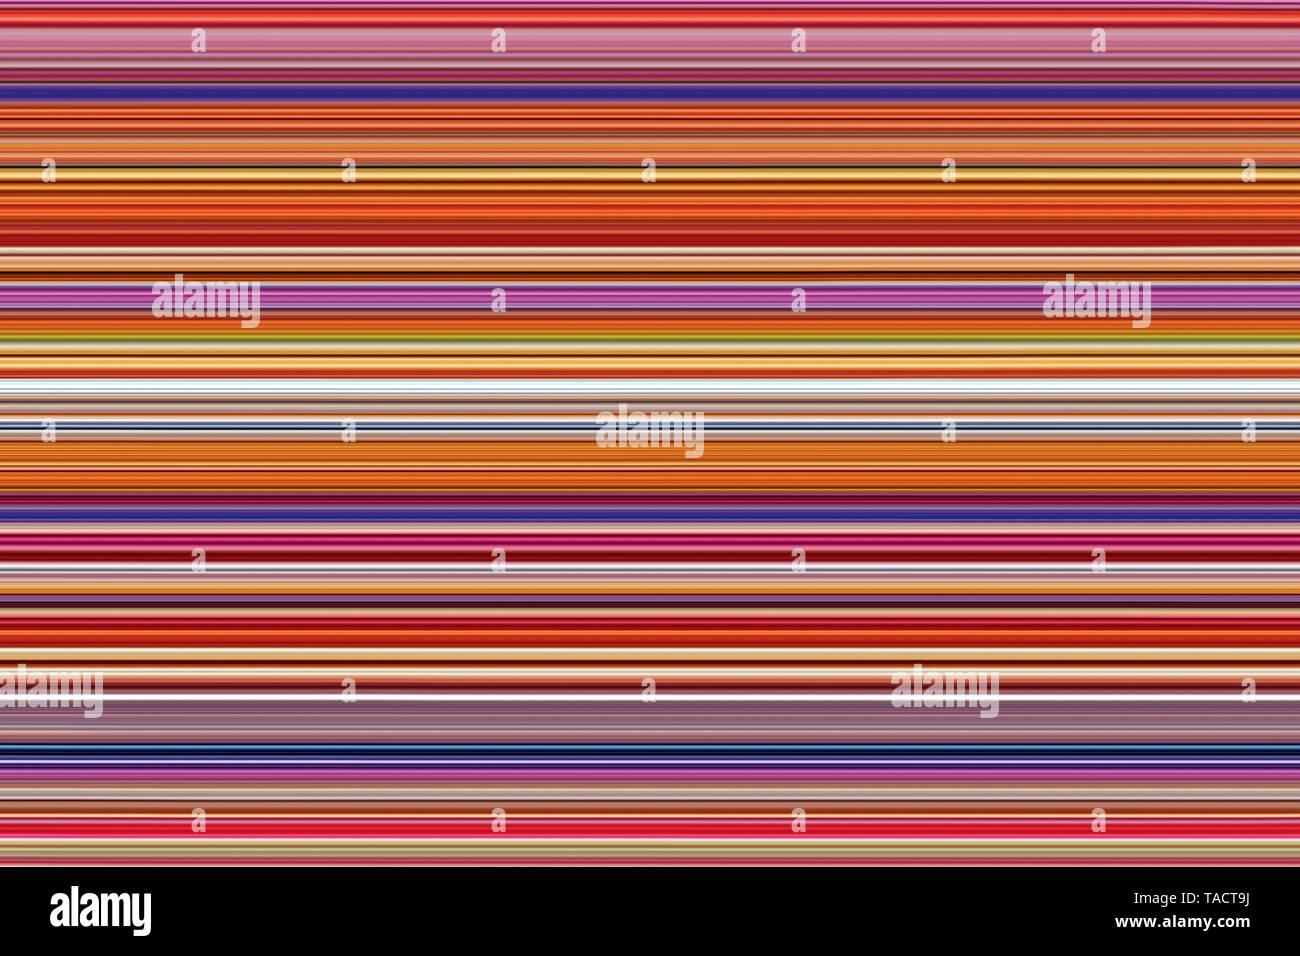 Modern fine art computer digital paintings creative hypnotist imagination colourful line vhm 10/11/2014. - Stock Image